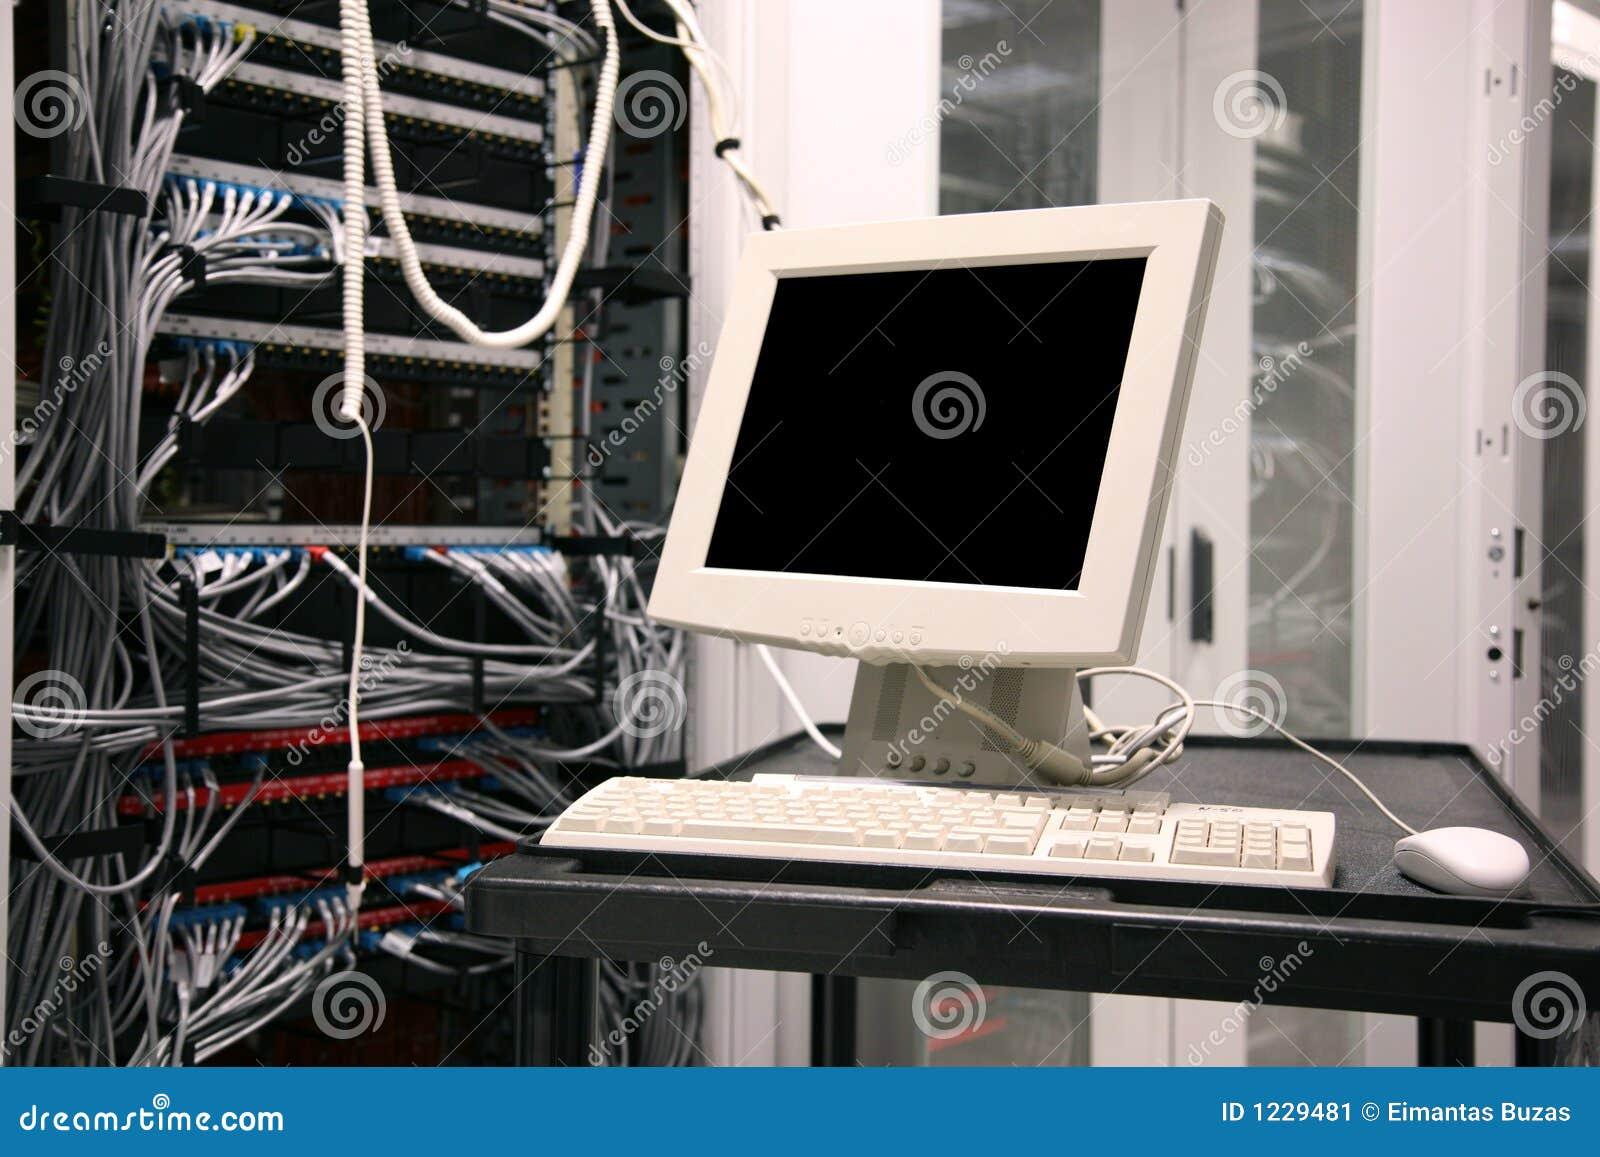 Server terminale